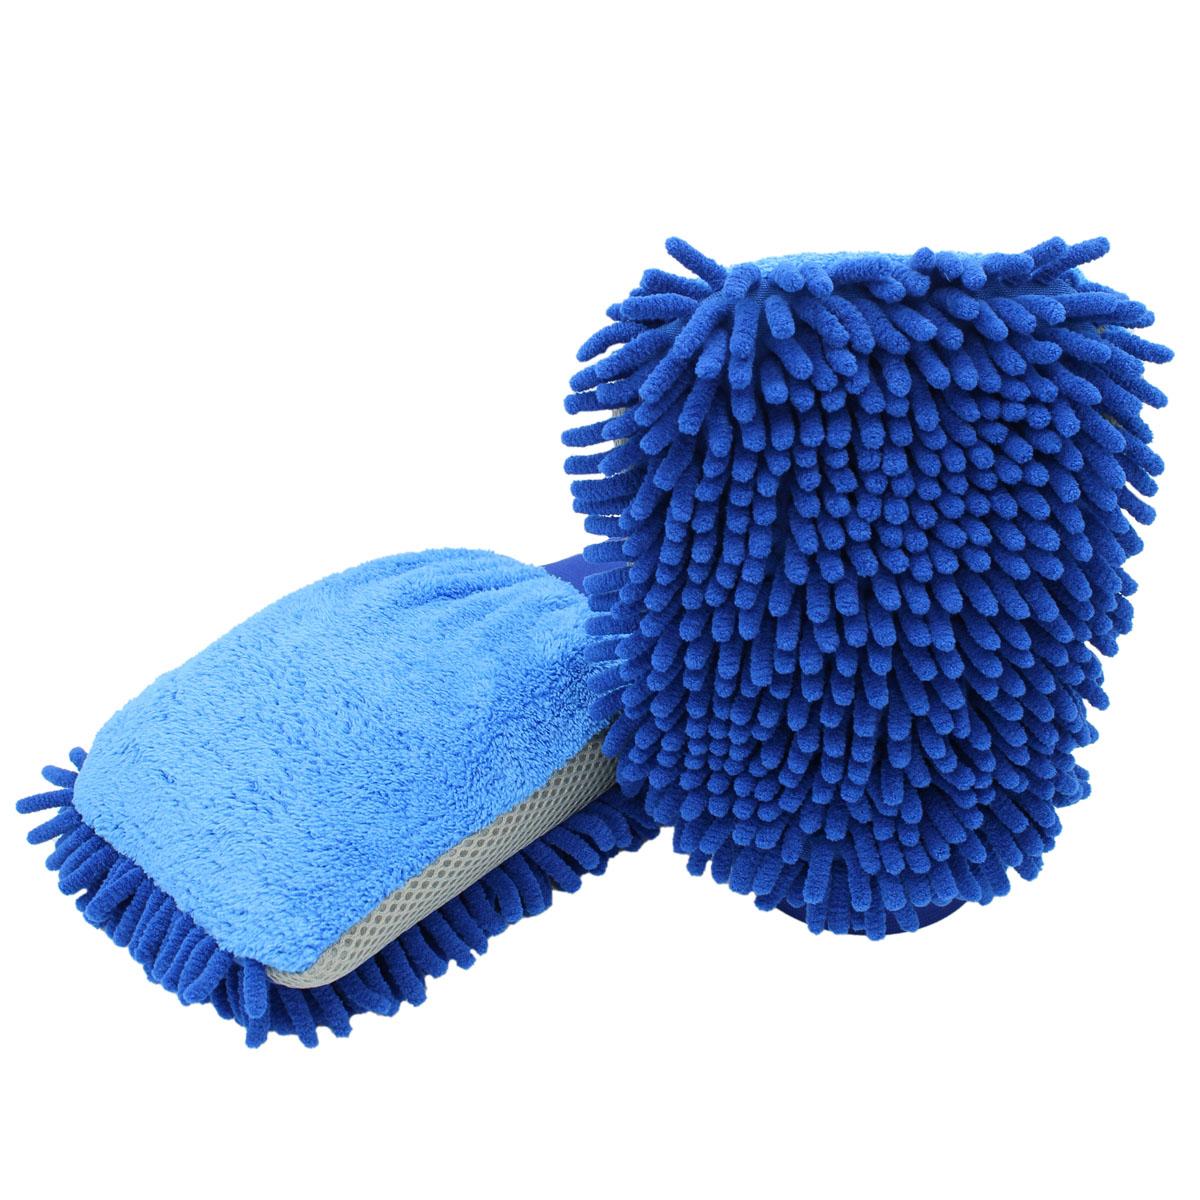 D&W Premium 3in1 Chenille Waschhandschuh blau/grau 22x17cm